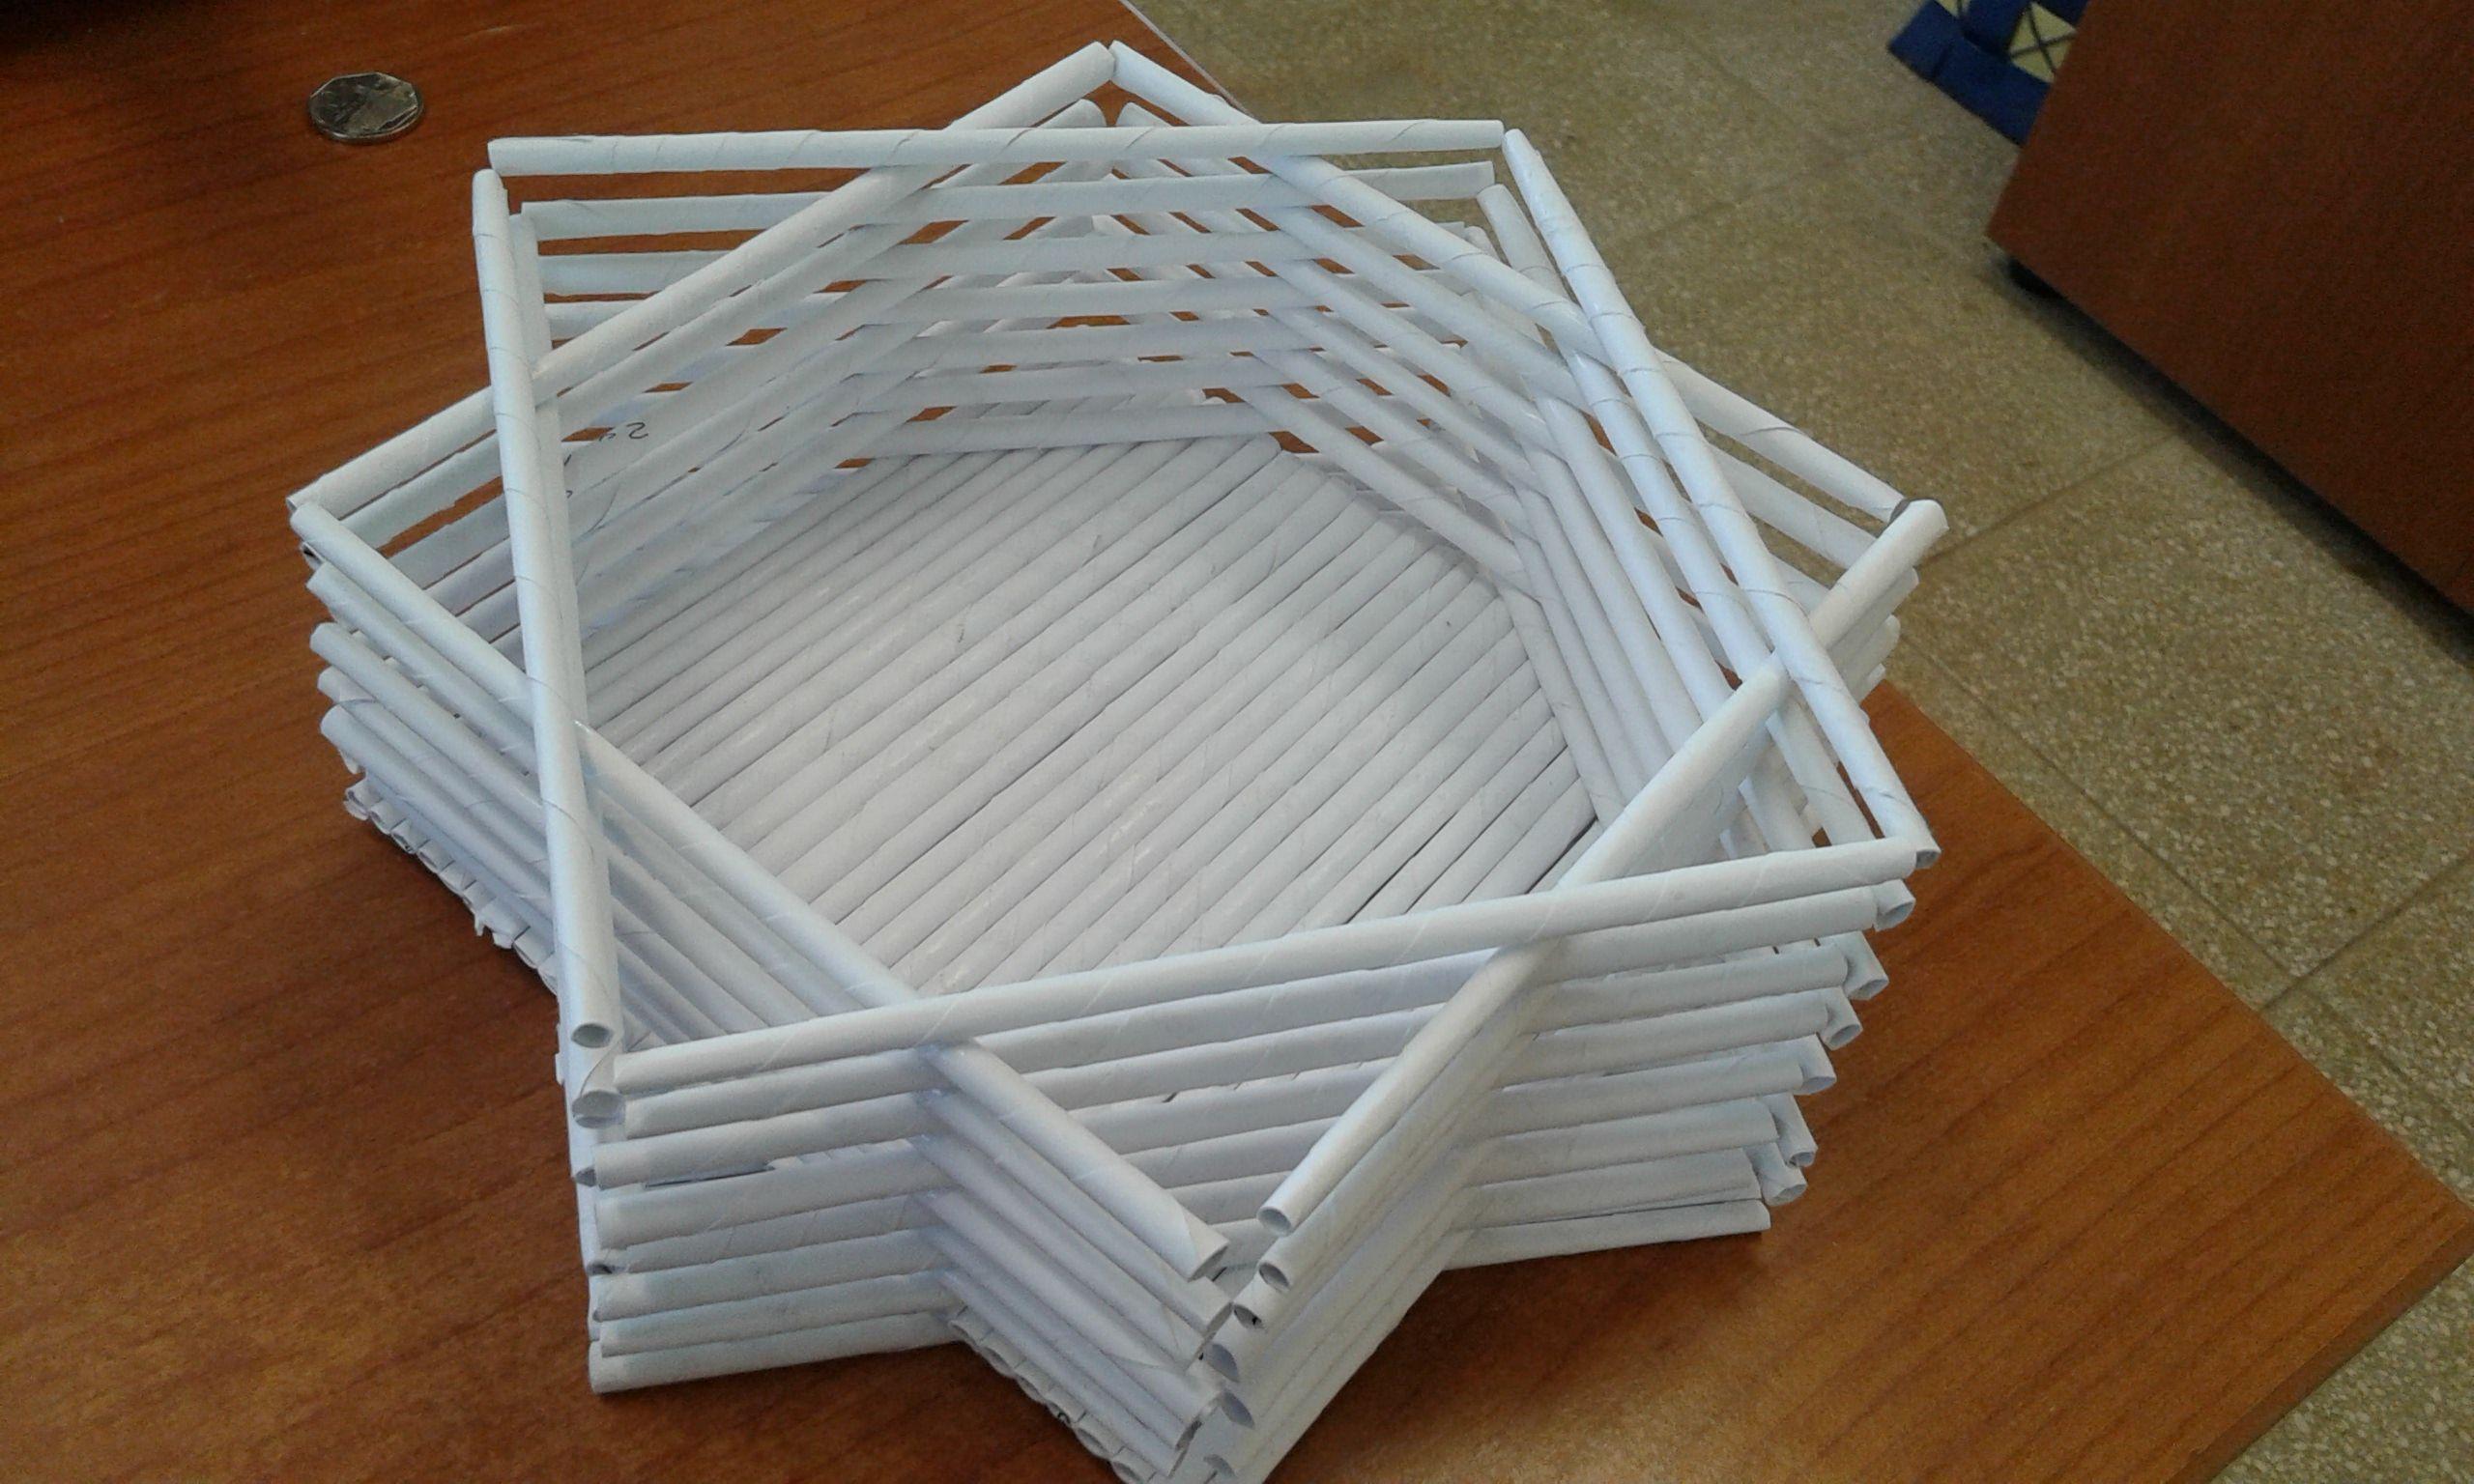 Used A4 paper sheet   Newspaper craft DIY   Pinterest   Newspaper ...